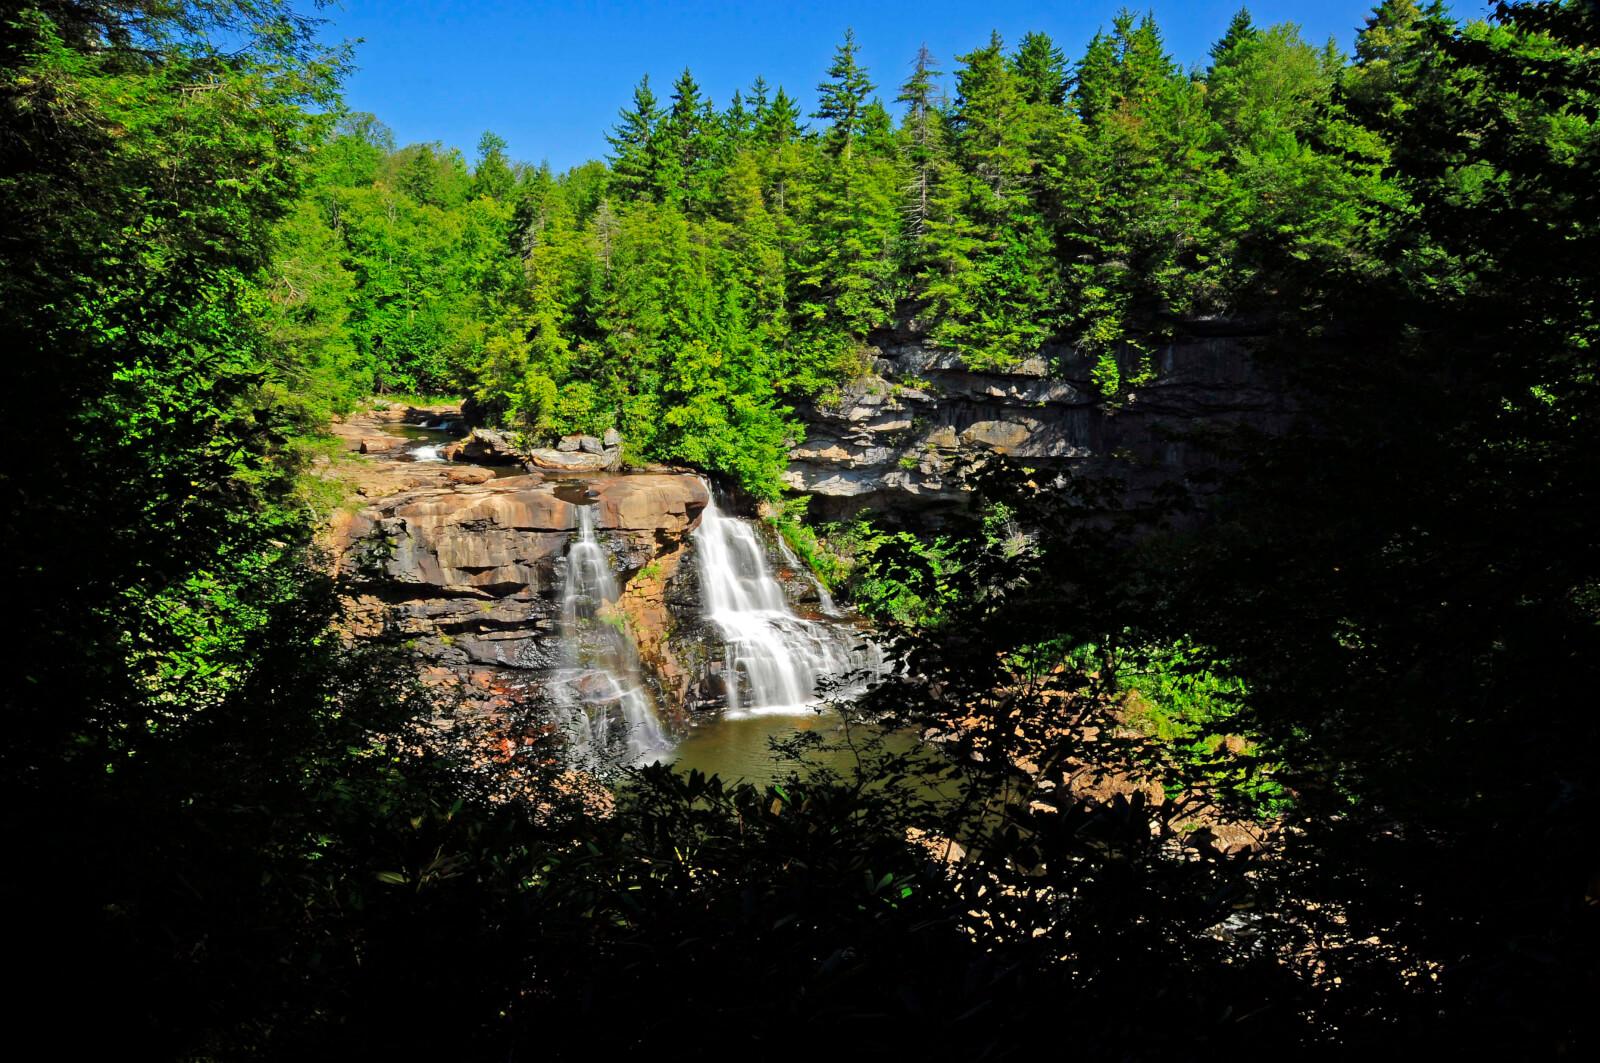 Blackwater Falls in West Virginia's Blackwater Falls State Park